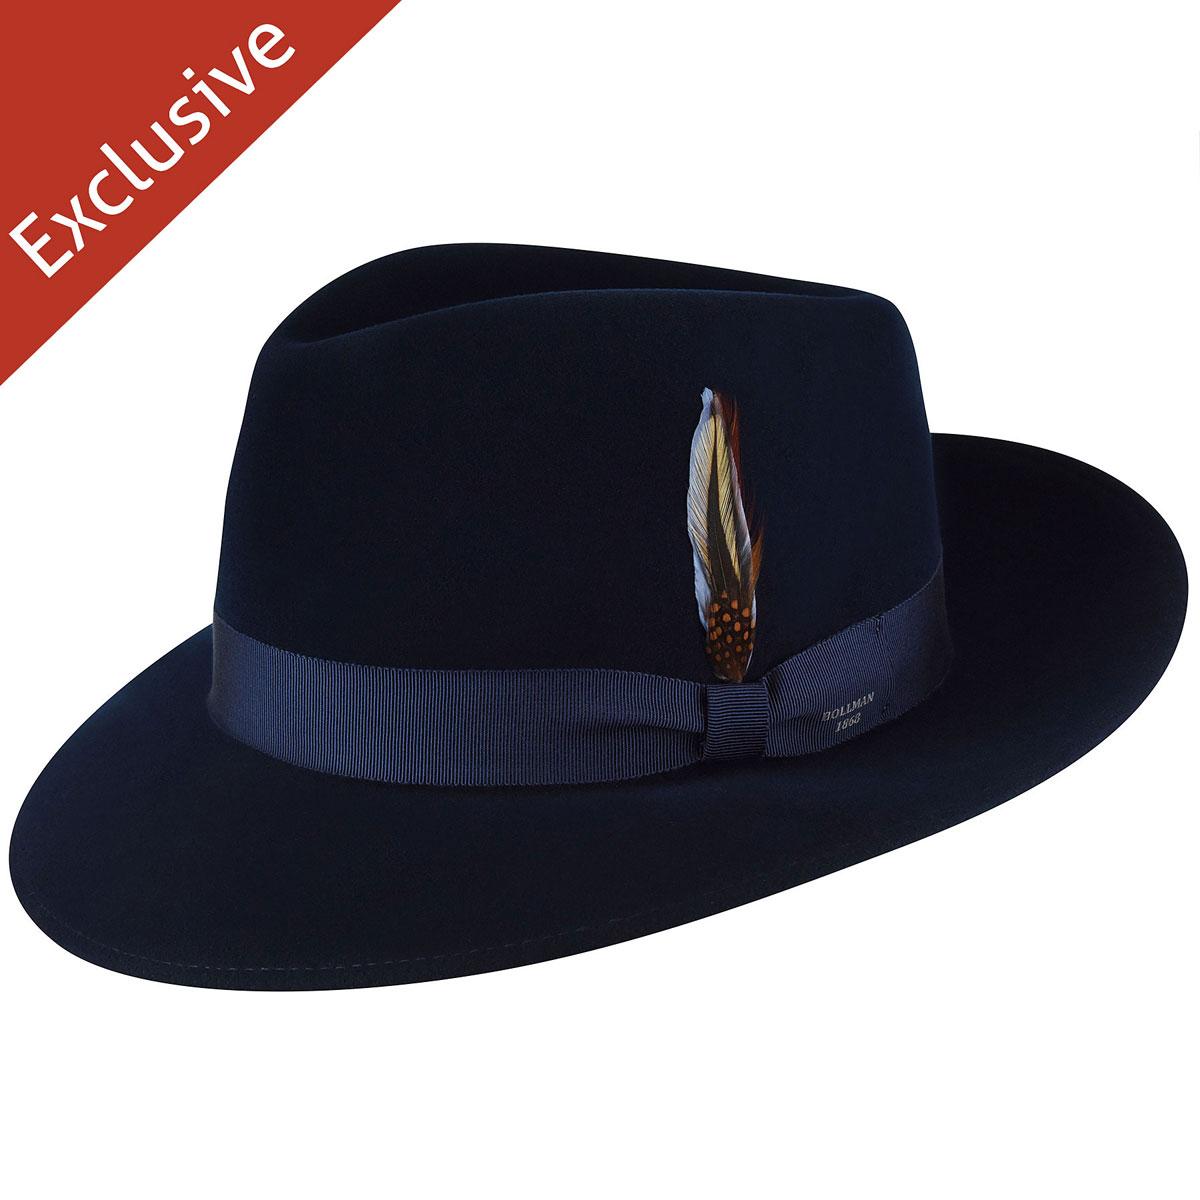 Gene H. Fedora - Exclusive - Dark Royal/XL